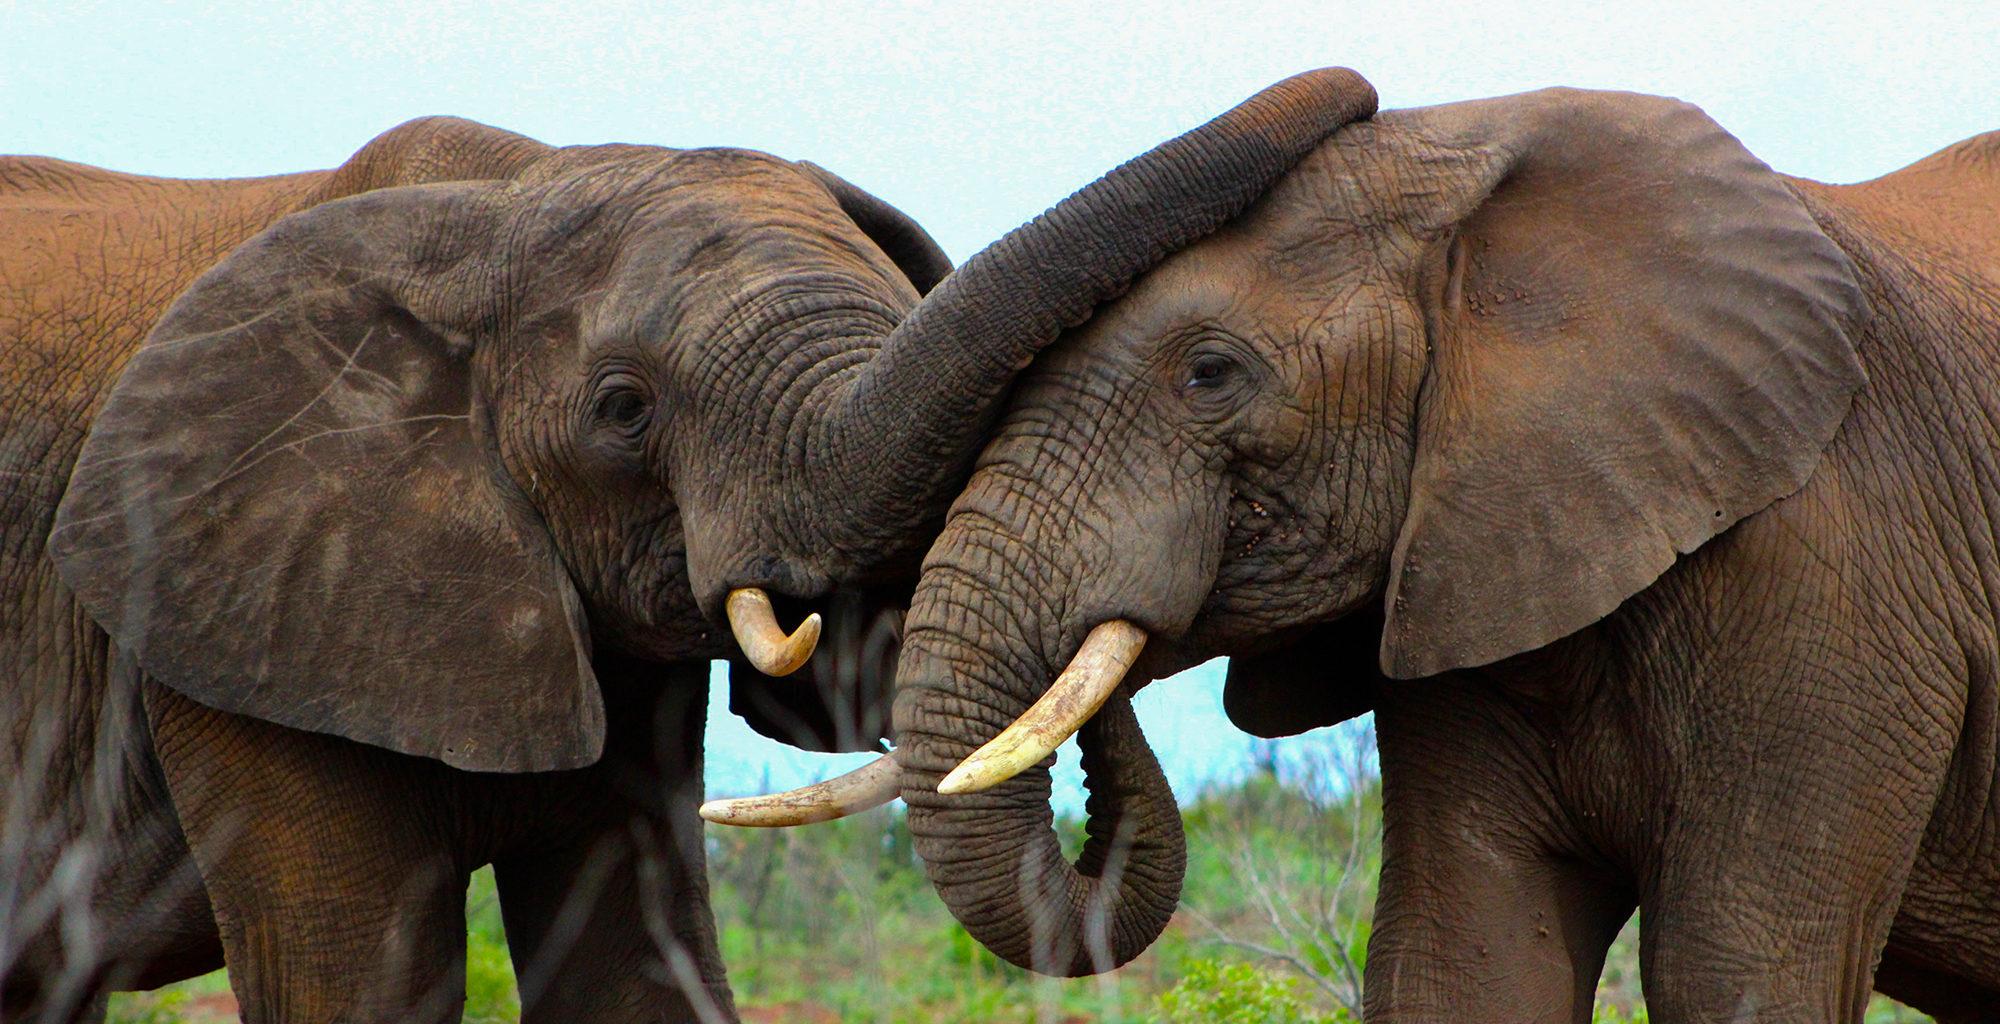 South-Africa-KwaZulu-Natal-Elephant